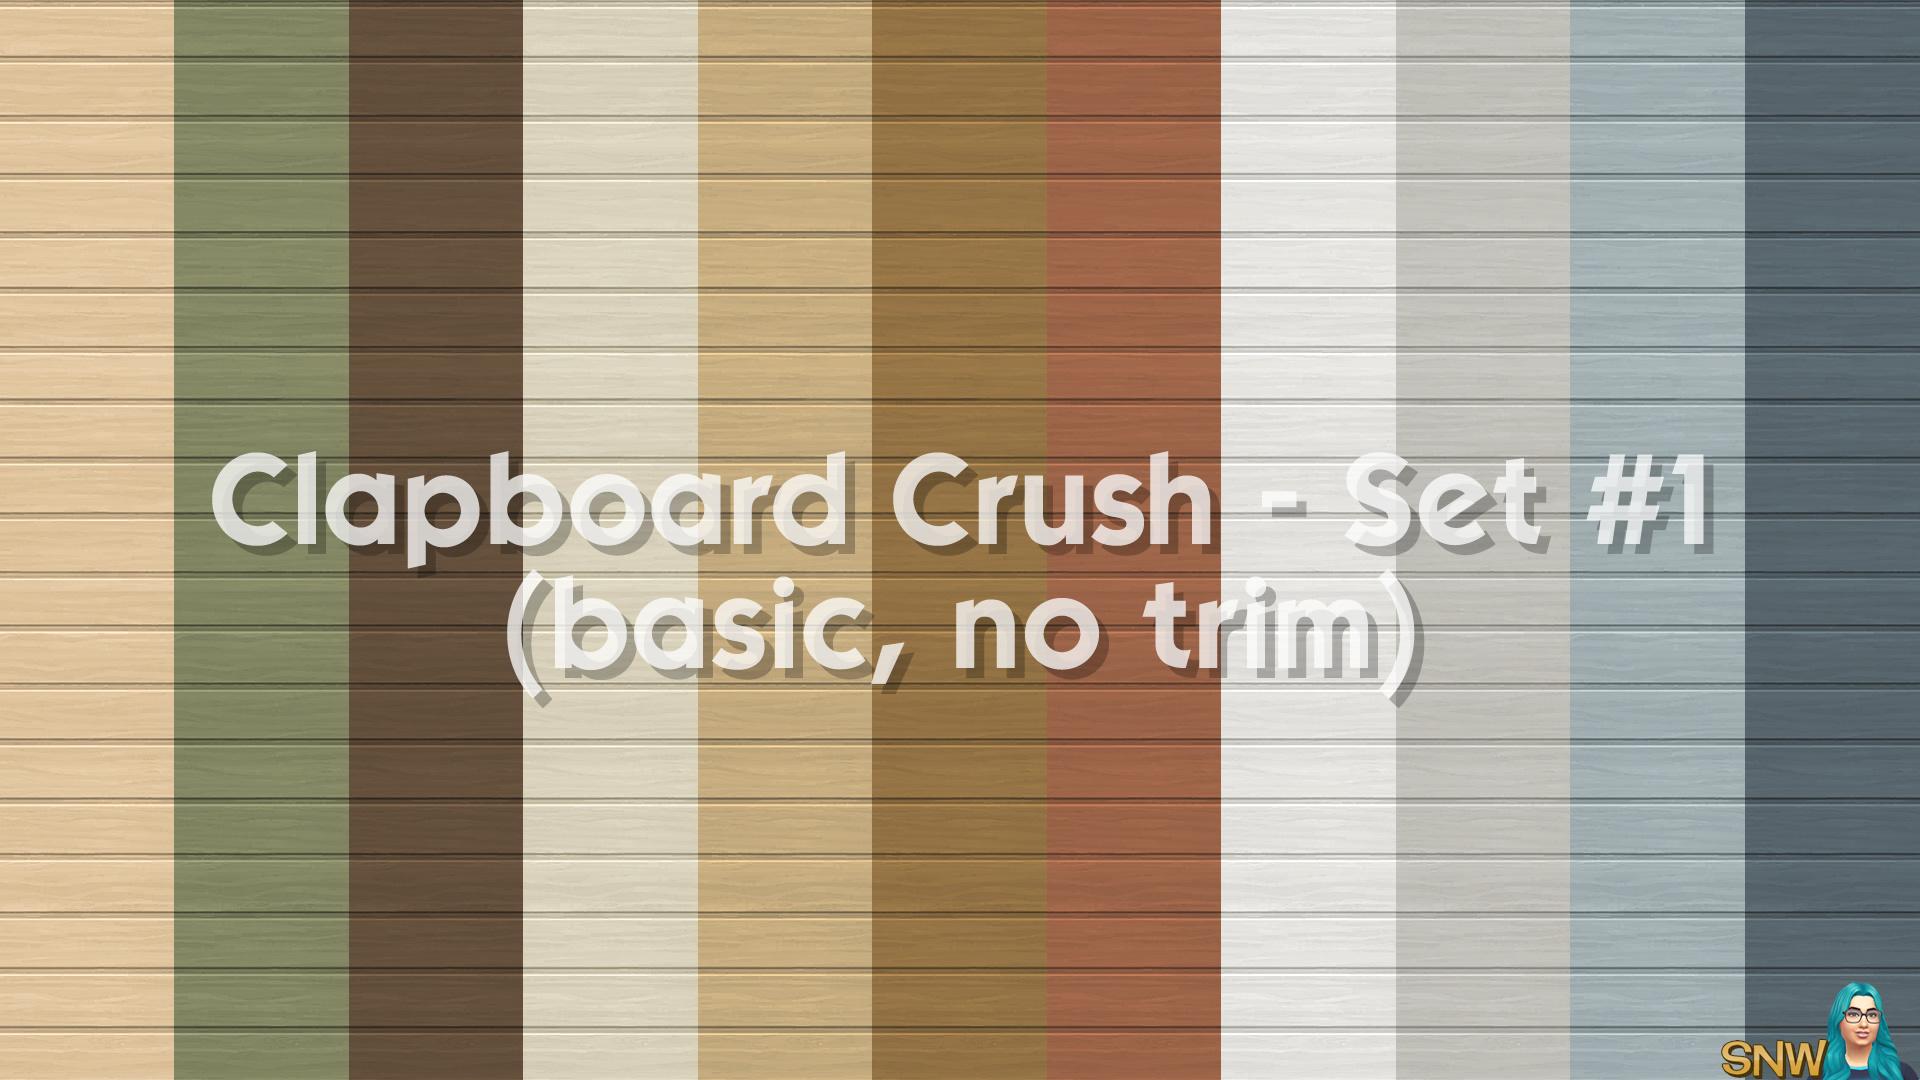 Clapboard Crush Siding Walls Set #1 Basic